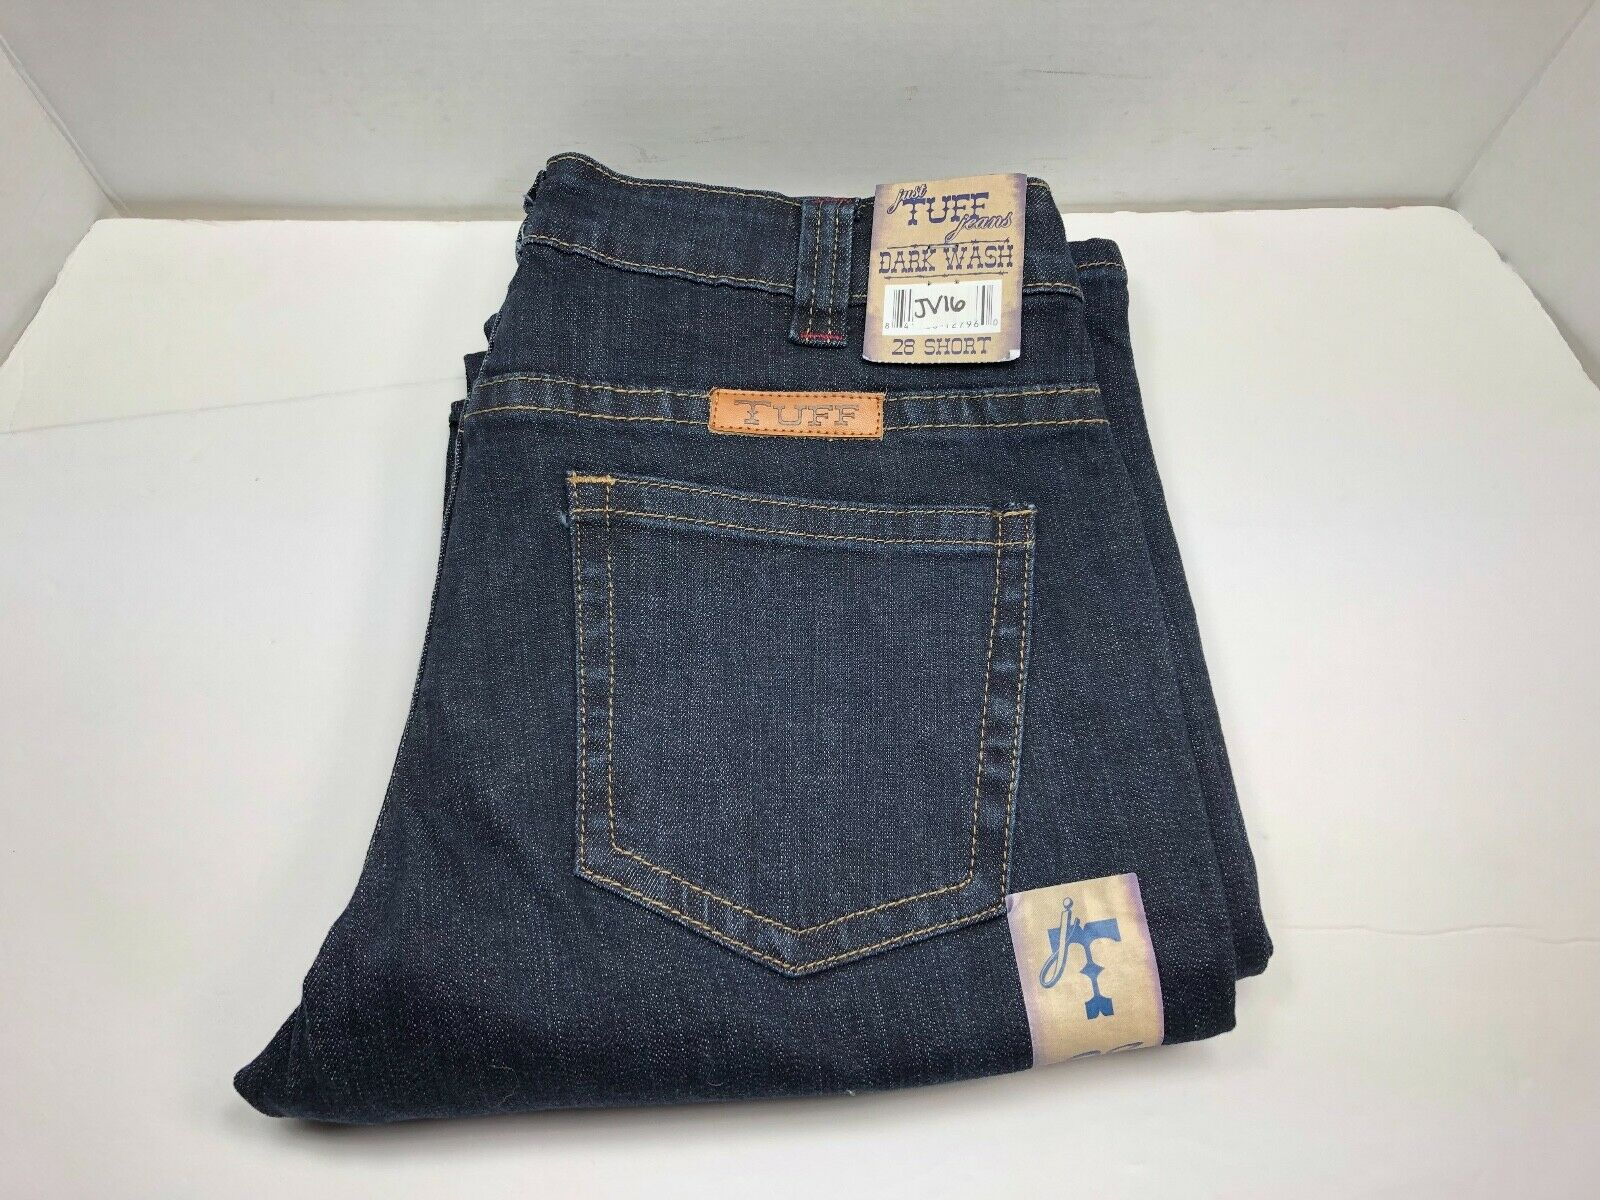 Cowgirl Tuff Women's 'Just Tuff' Dark Wash Bootcut Jeans, Size 28 Short (JV16)